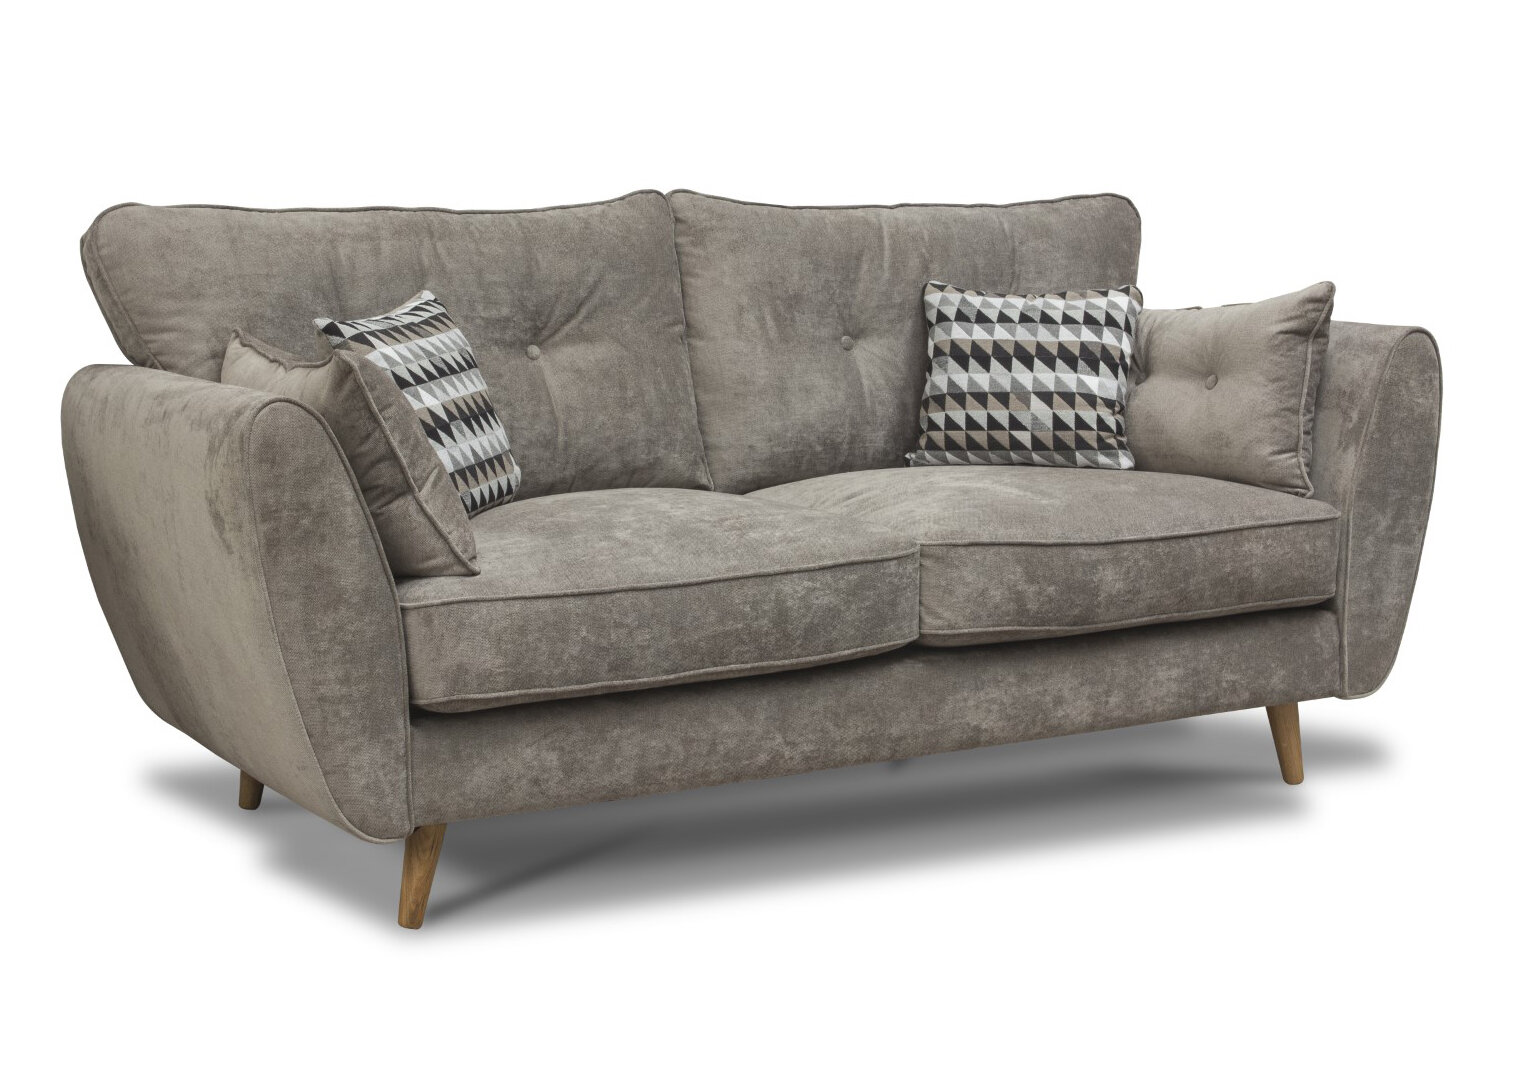 Marlo Fabric Sofa - Grey 1